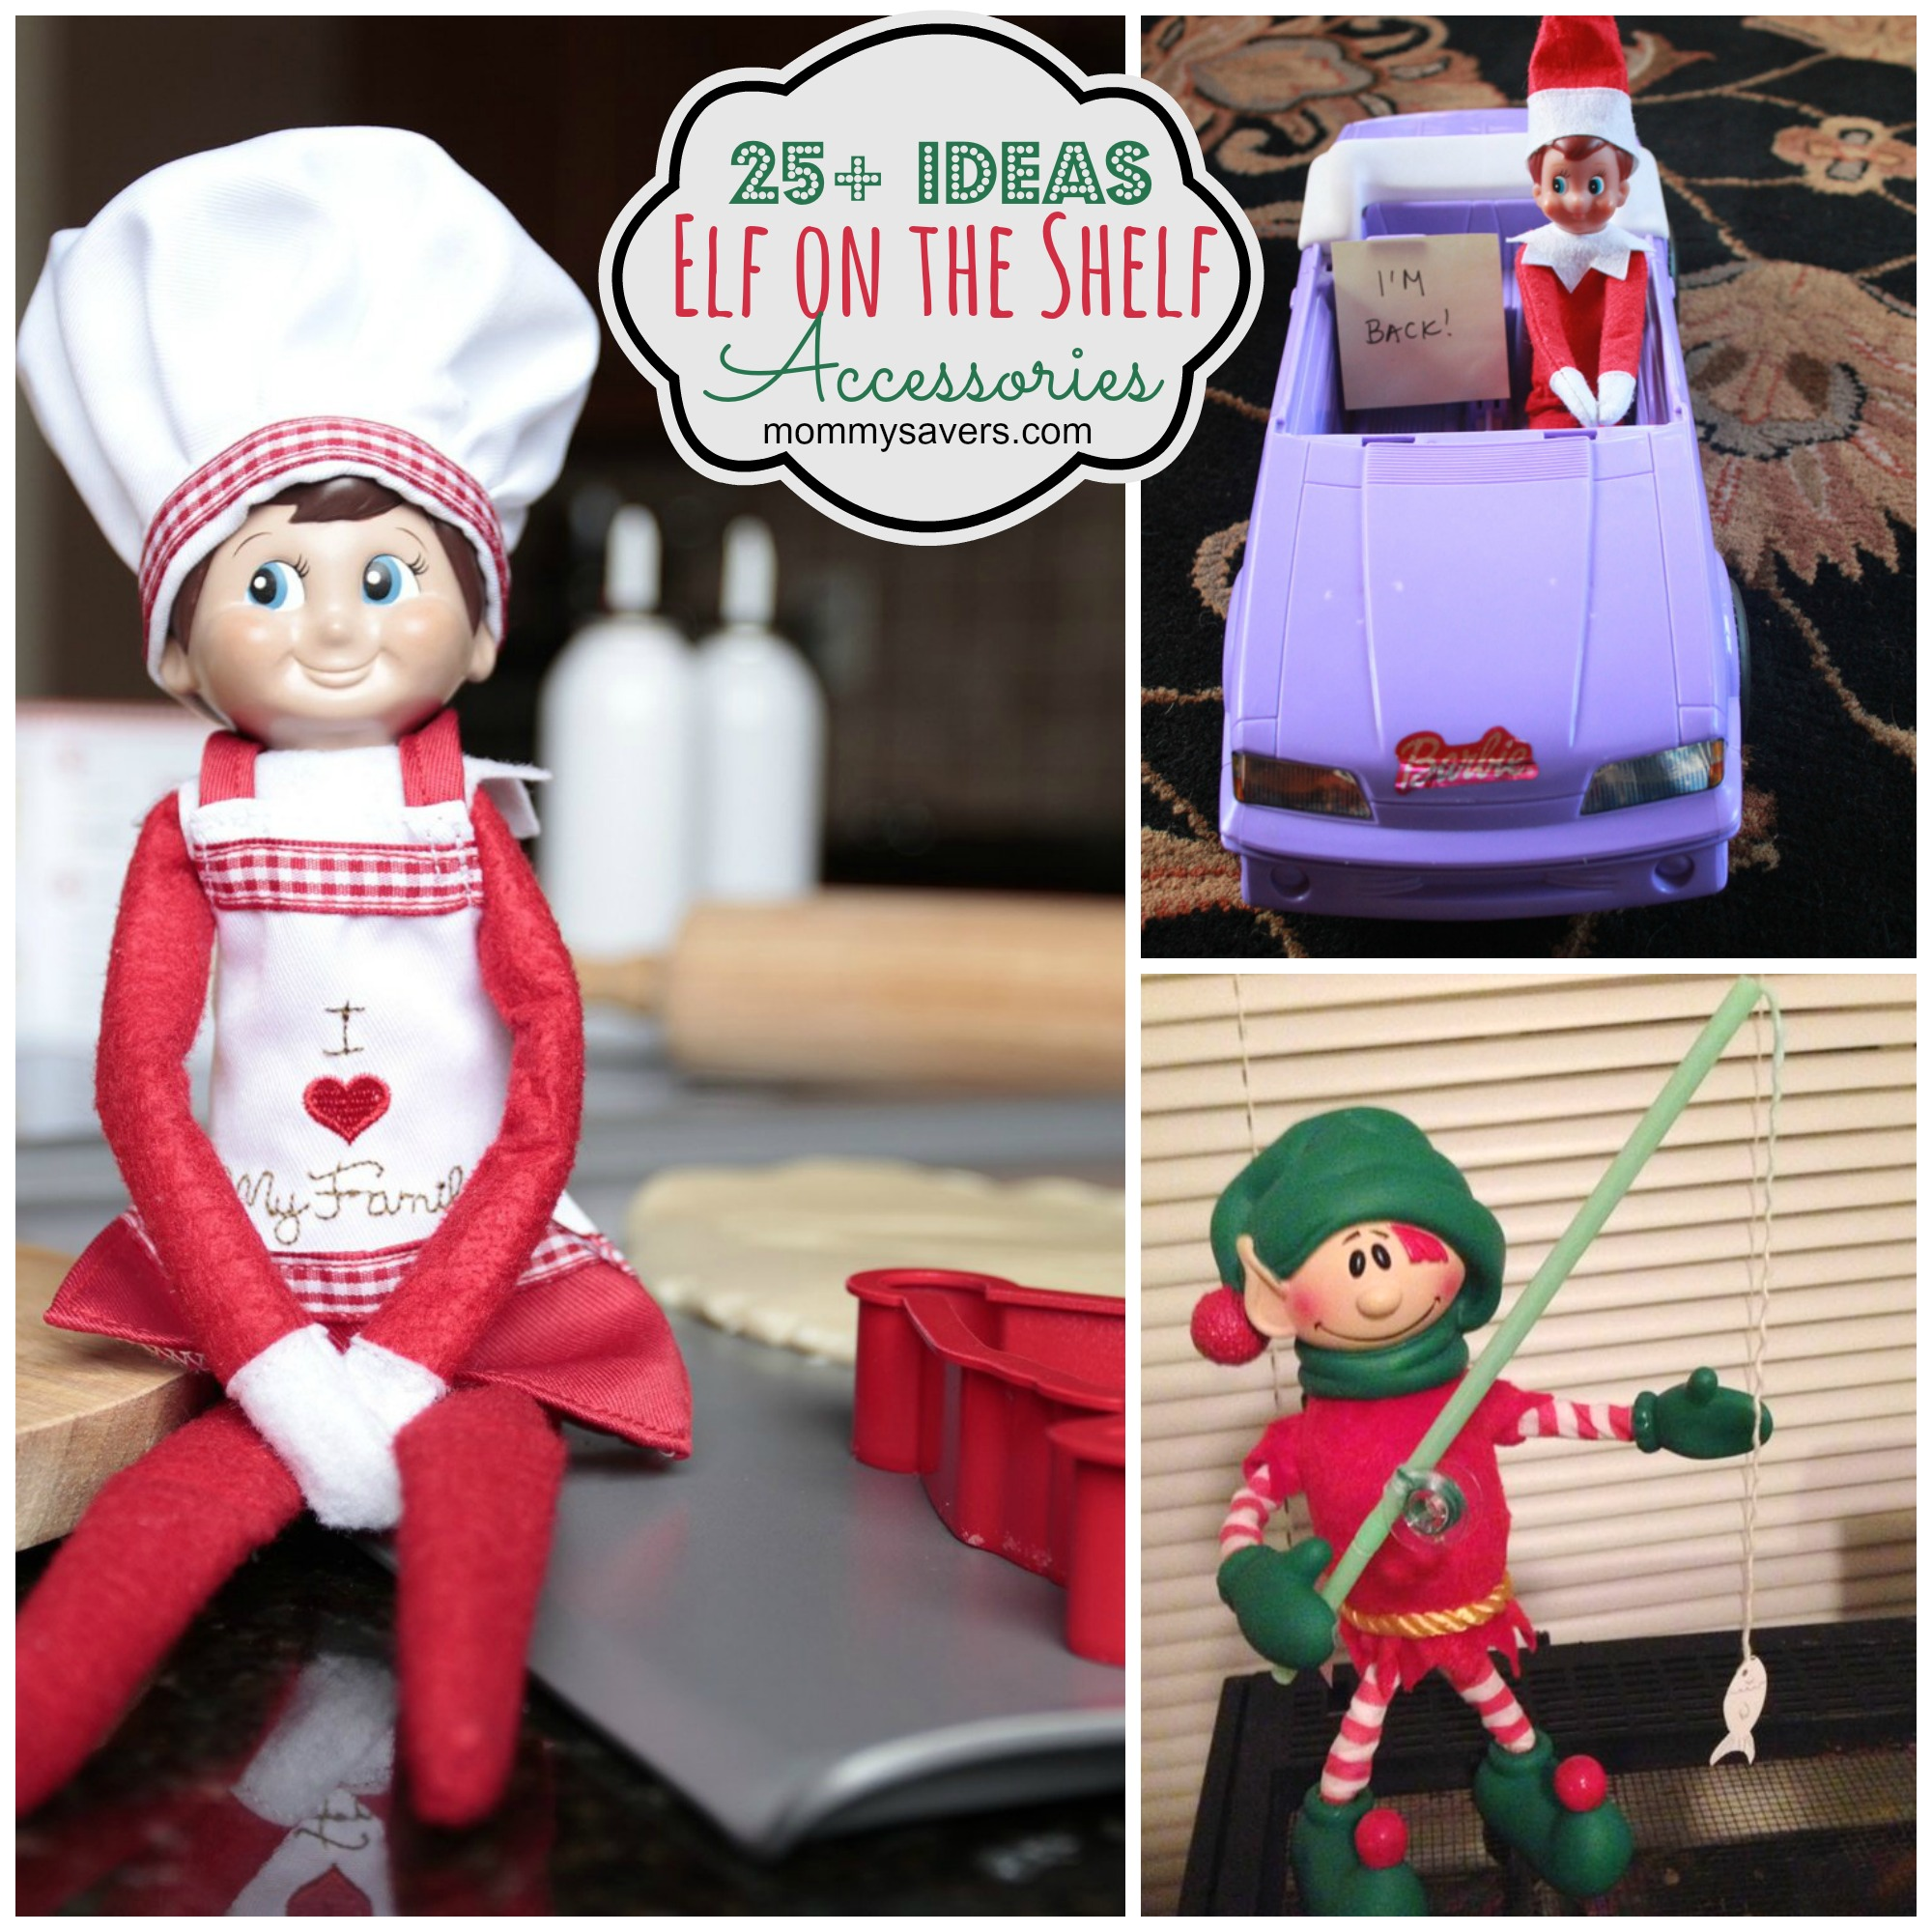 Elf On The Shelf Accessories